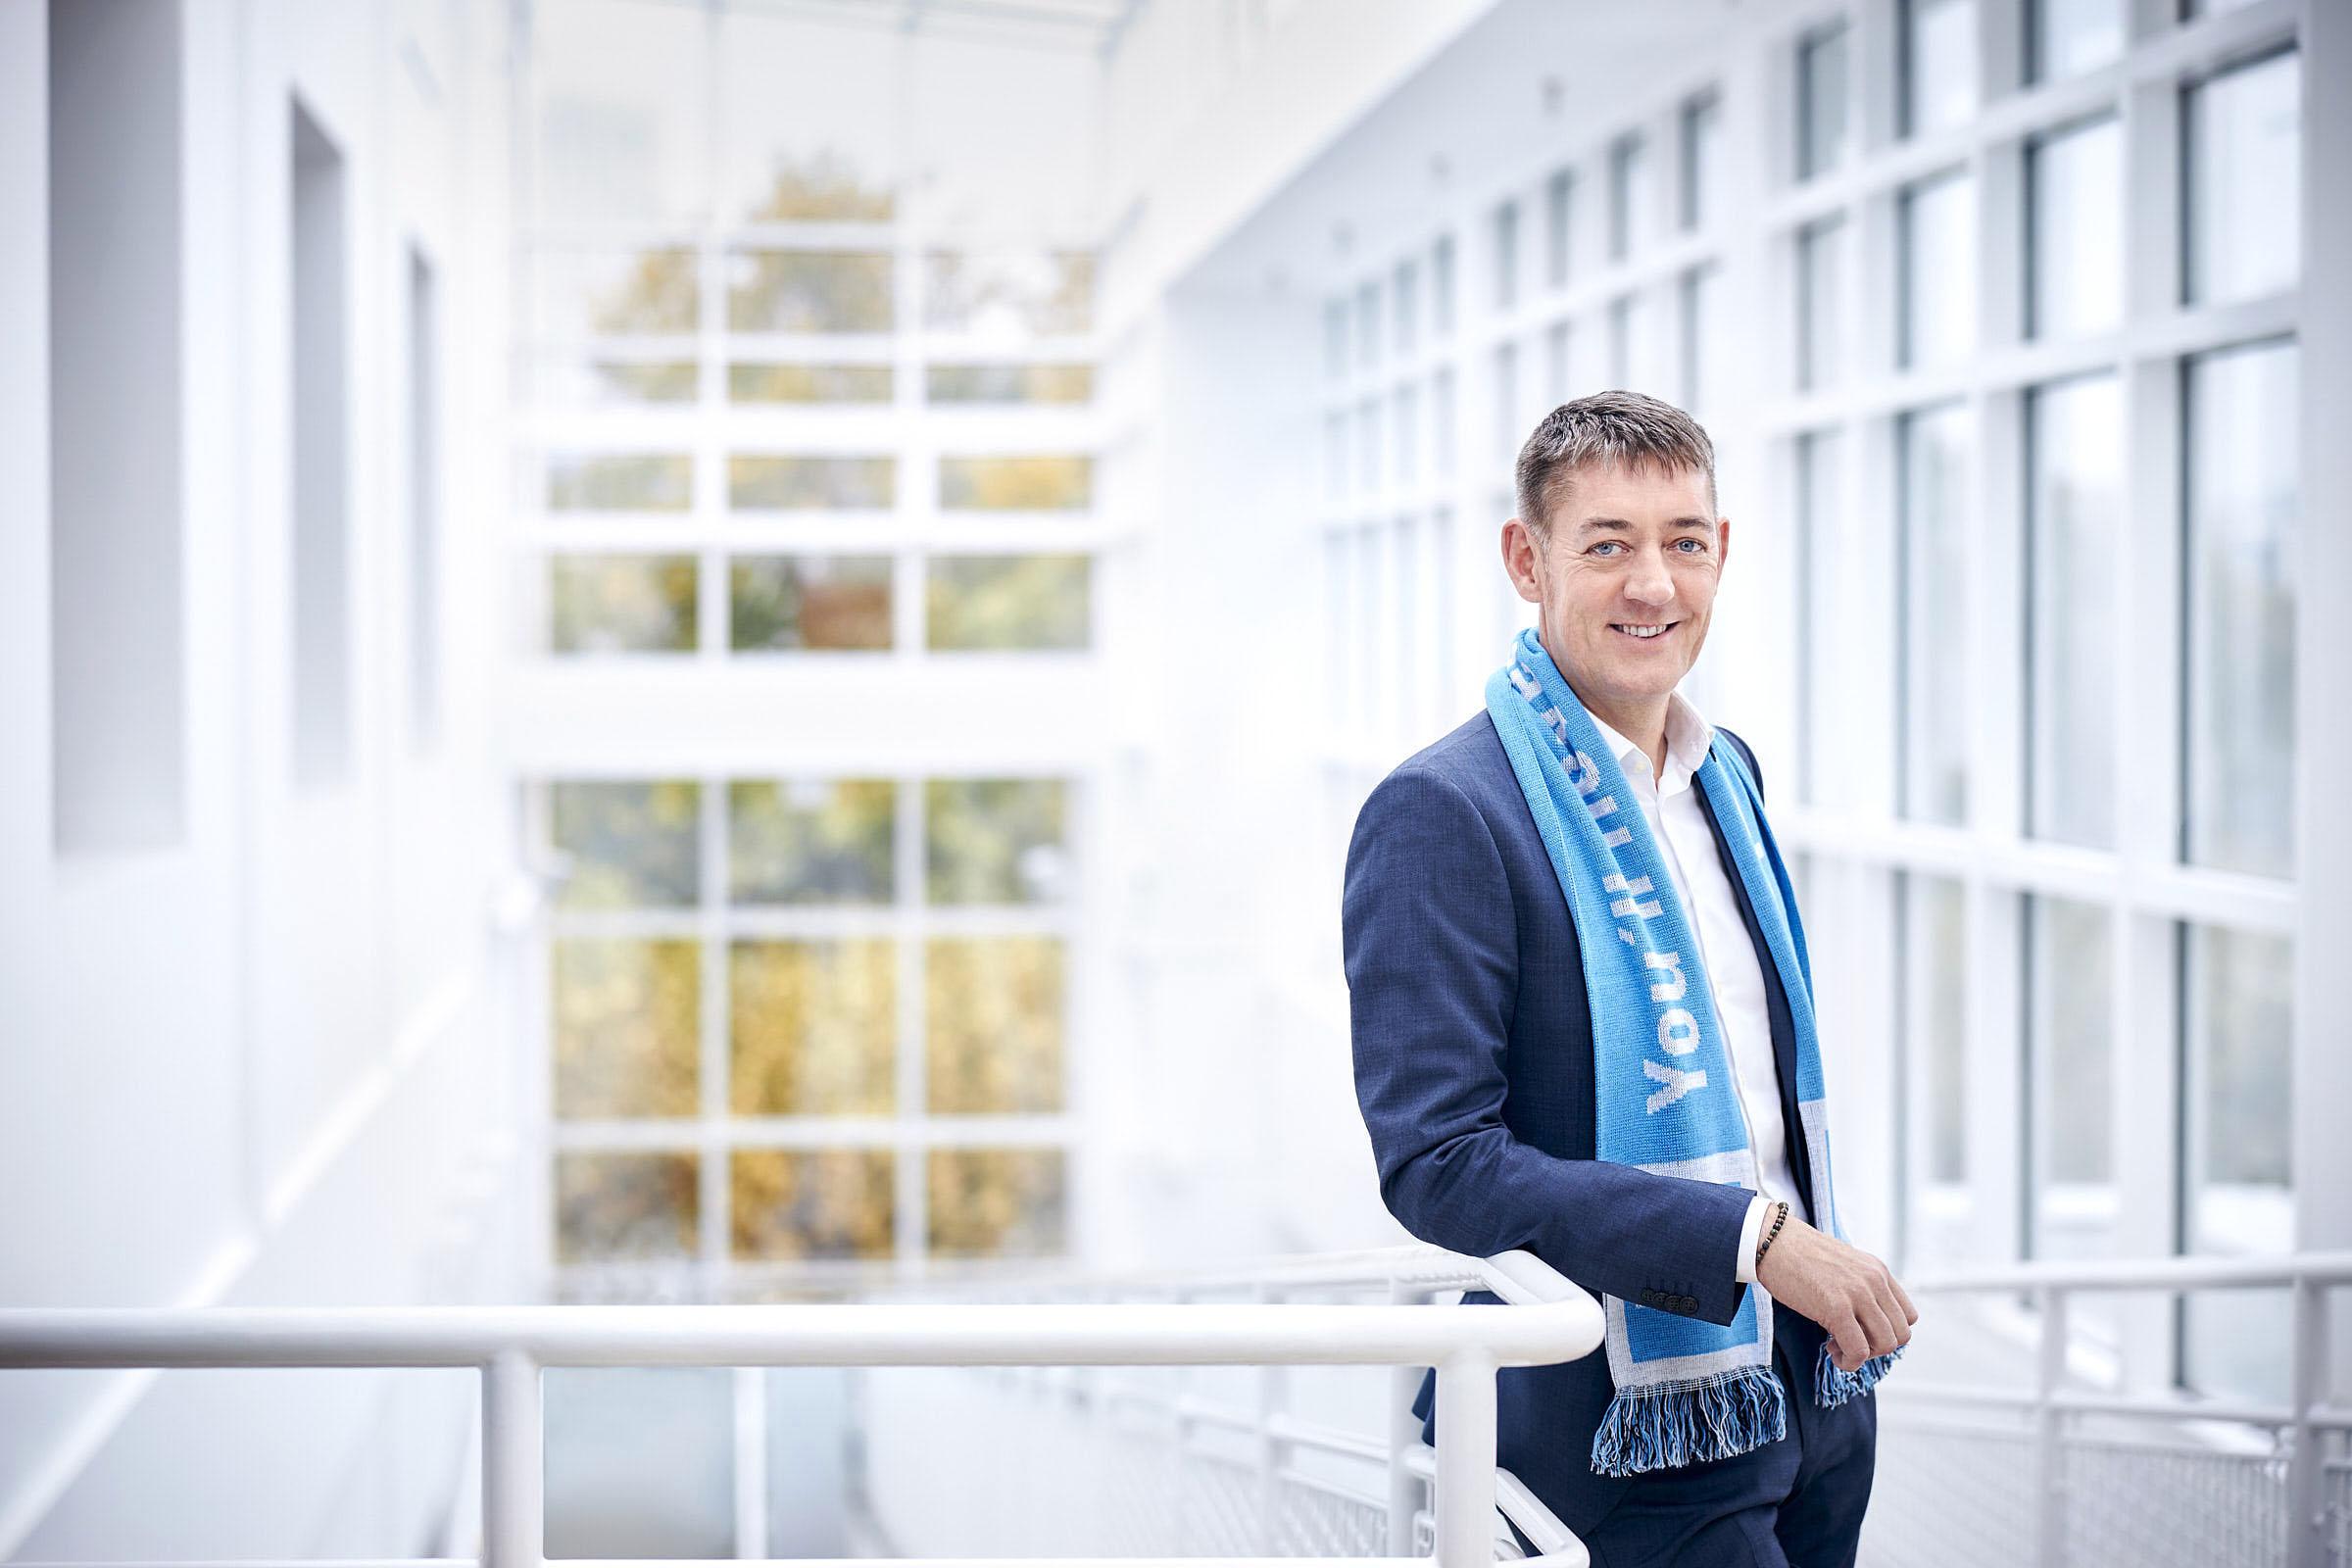 Ulrich Siepe, BMI Group, am 08.10.2019 in Frankfurt